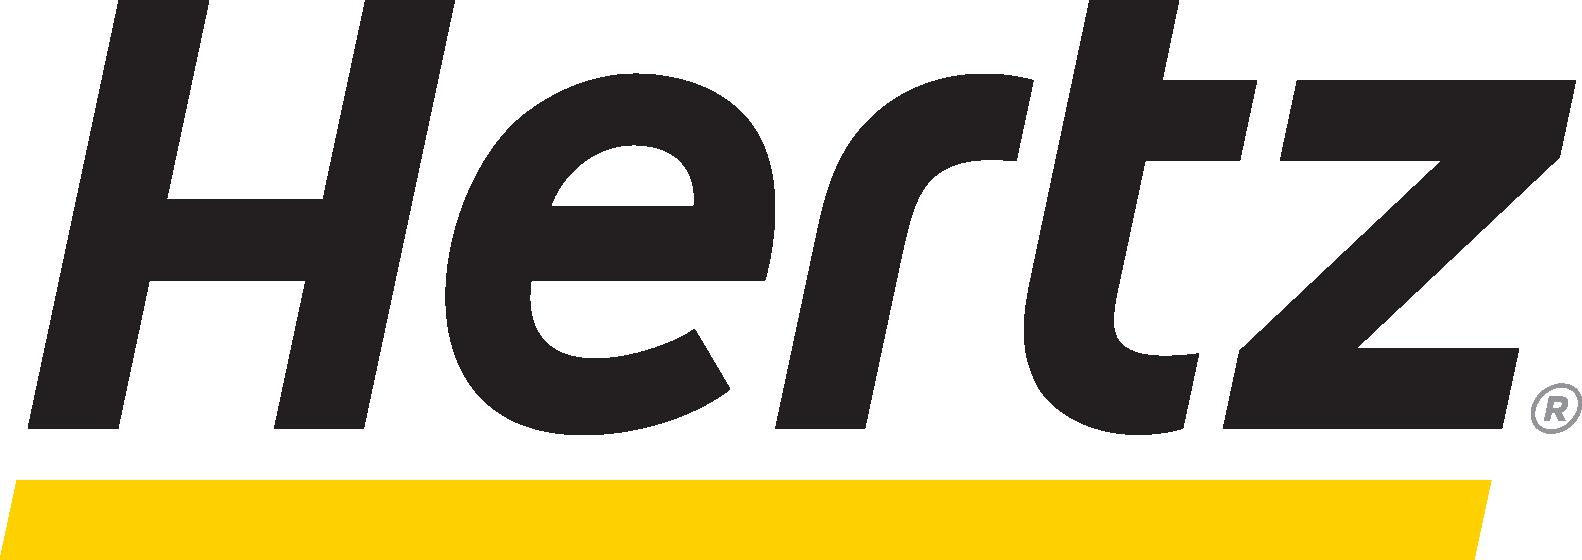 Hertz-Logo-PNG.png